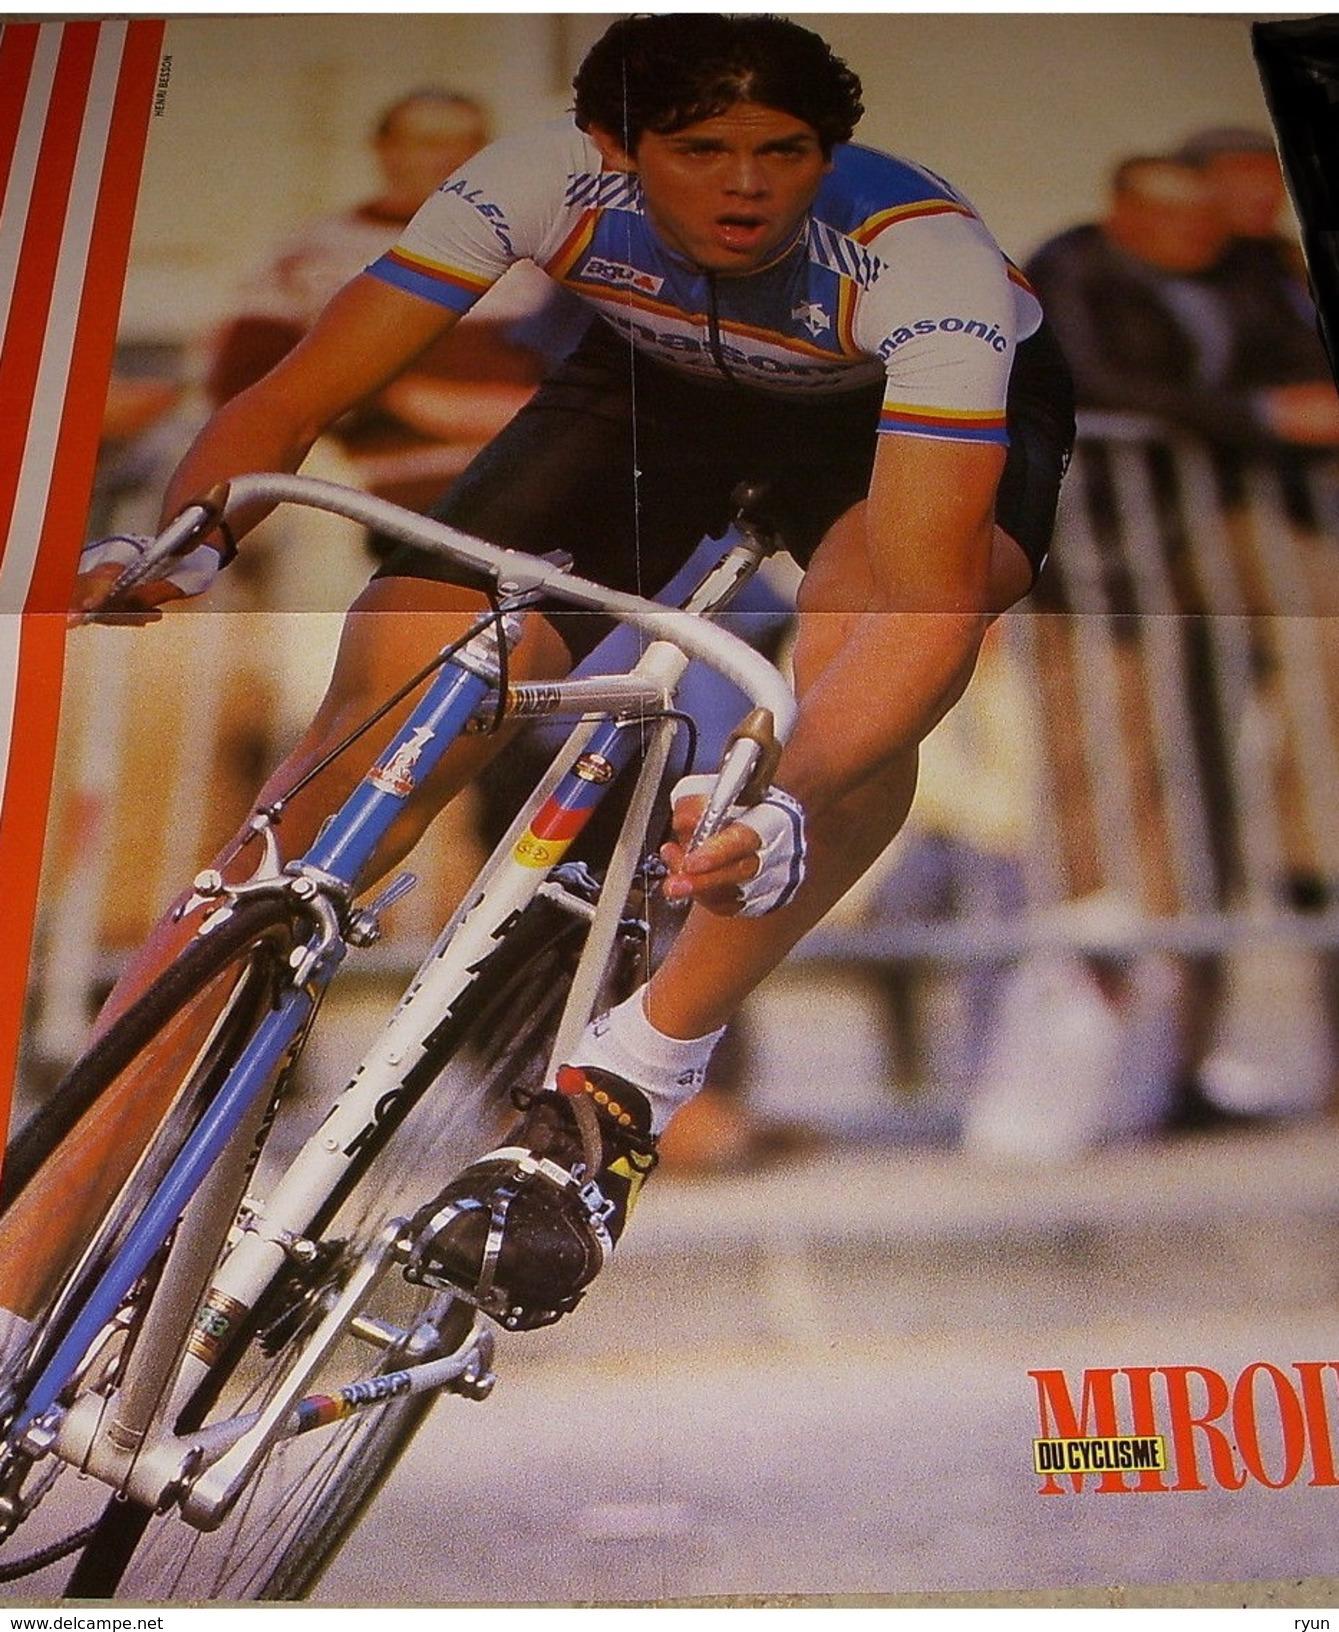 Miroir Du Cyclisme N° 365 Mars 85 Avec Poster Grewal - Sport